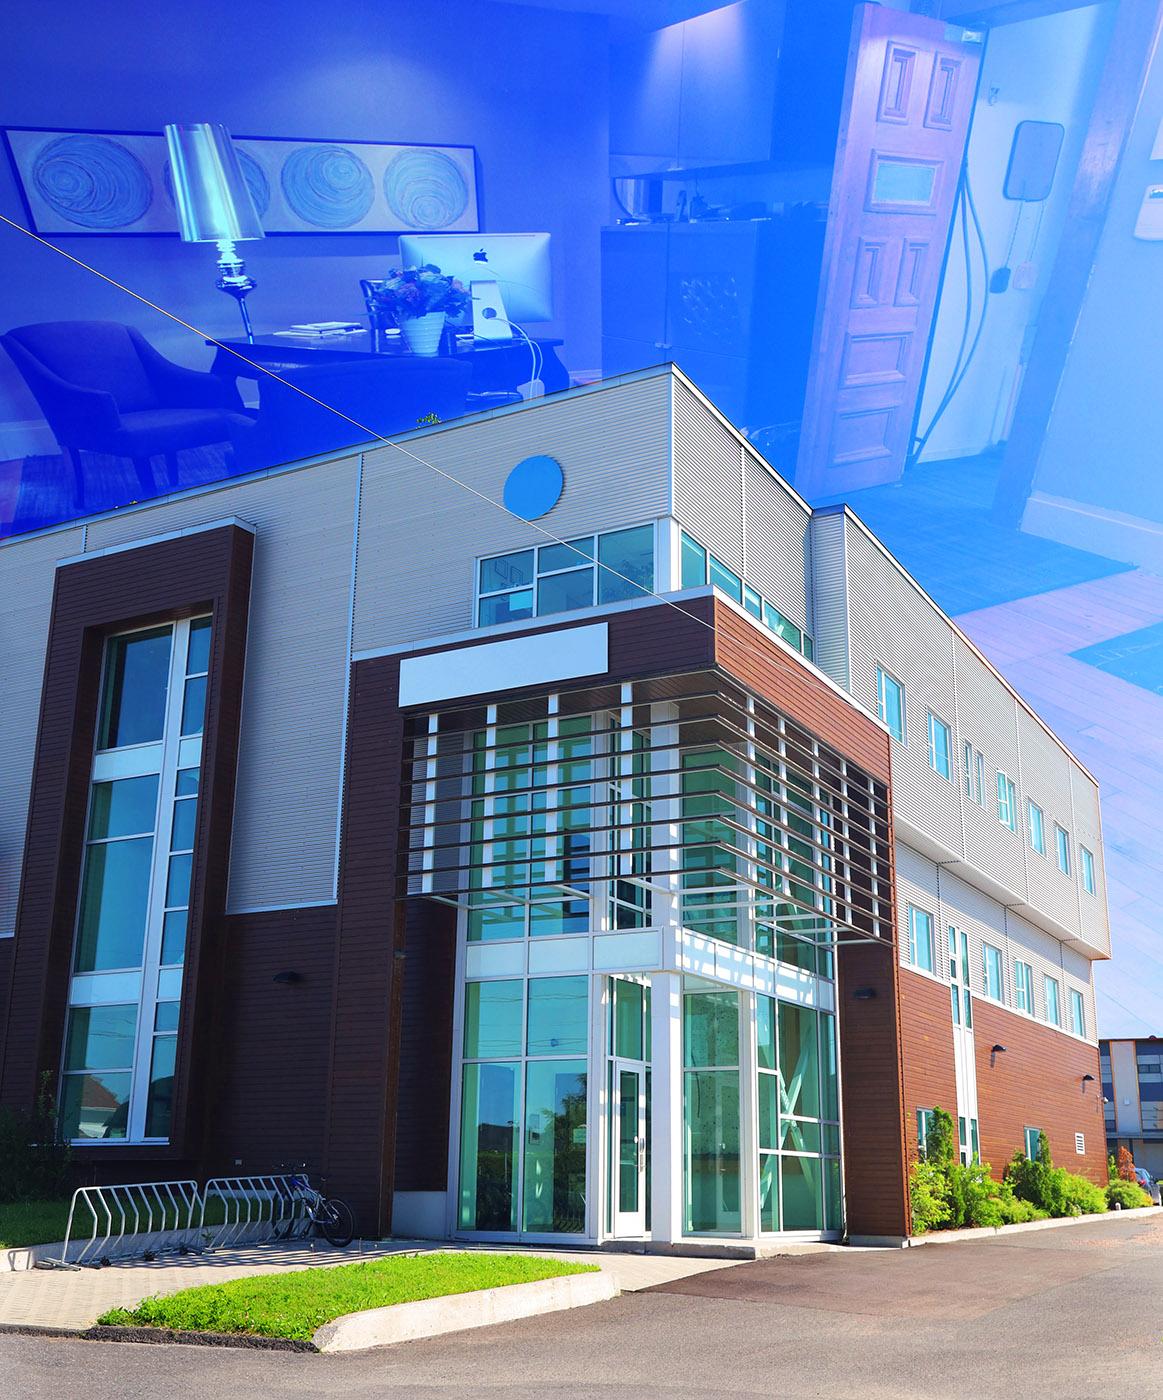 Modern Office Building - RF Stock Image